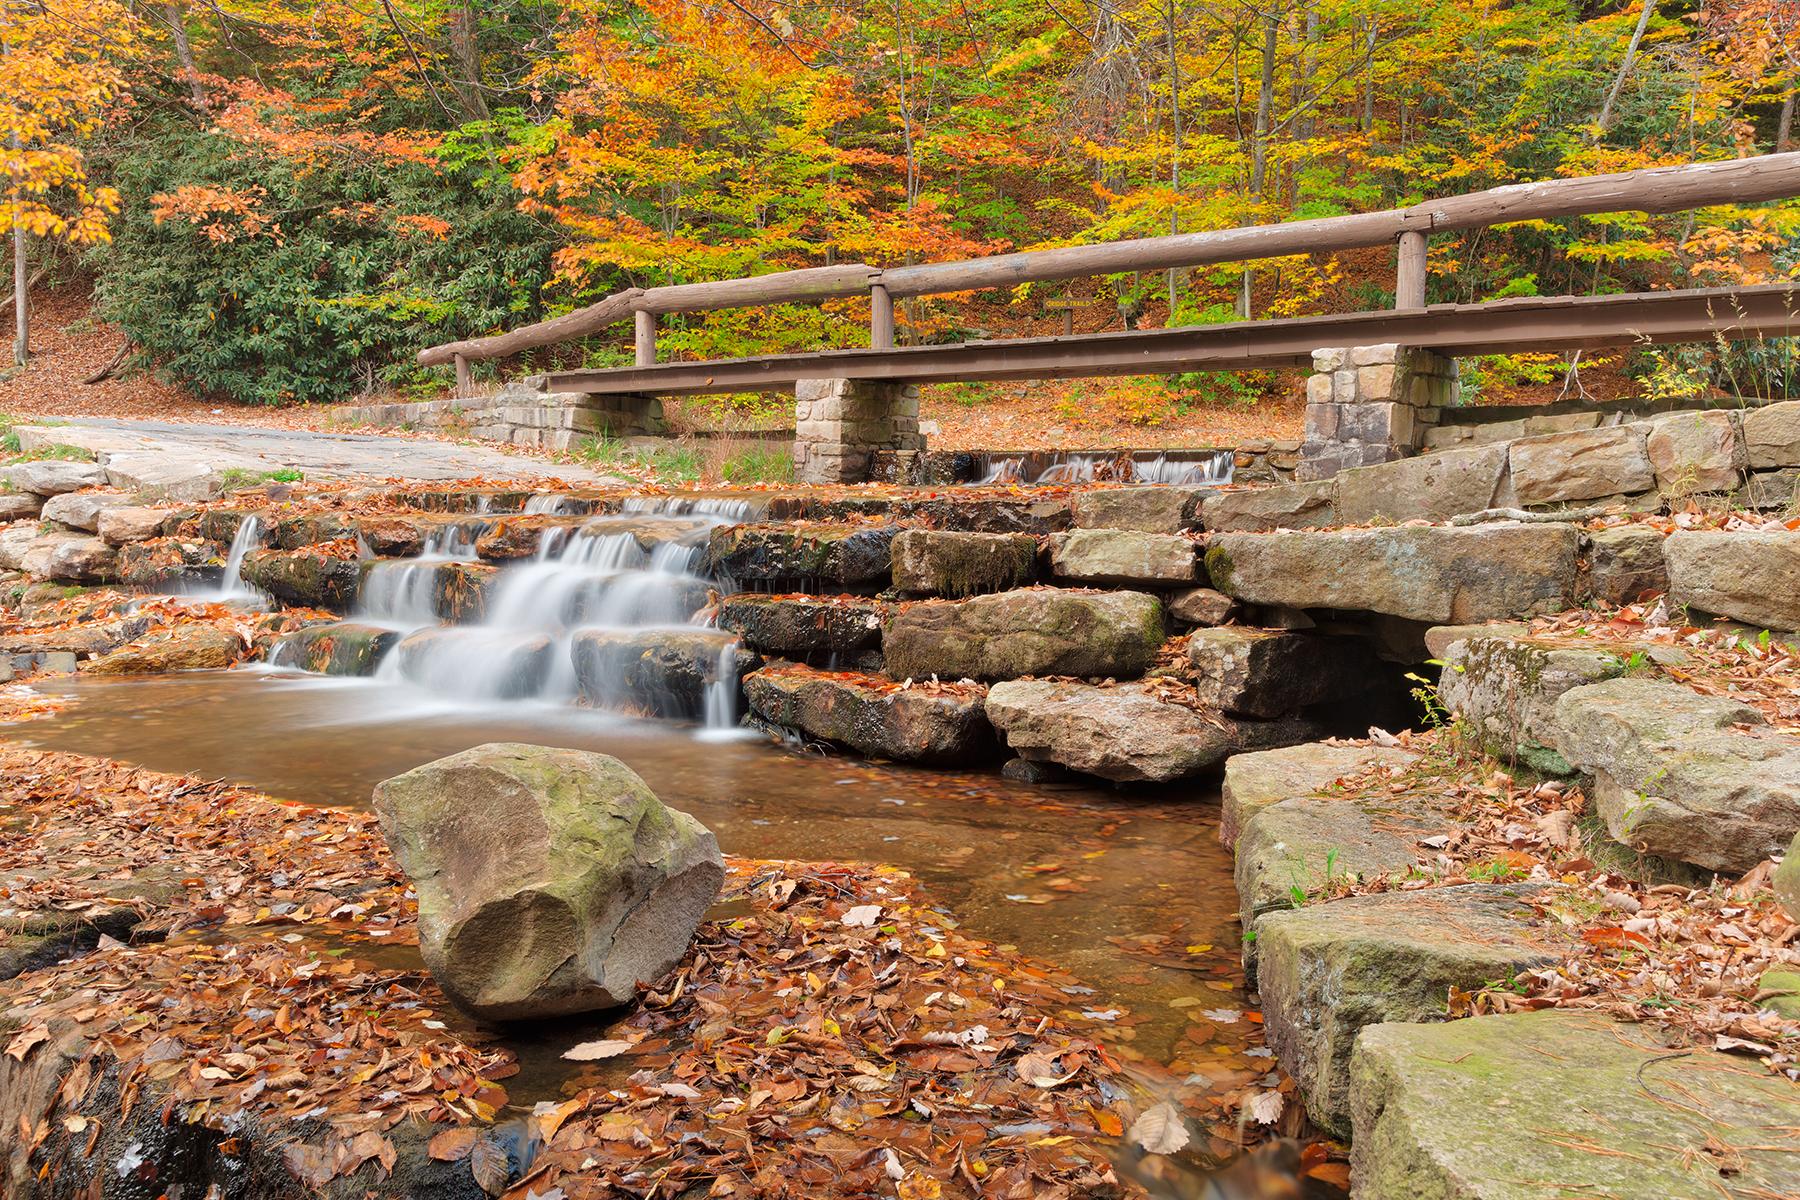 Autumn roadside cascades - hdr photo